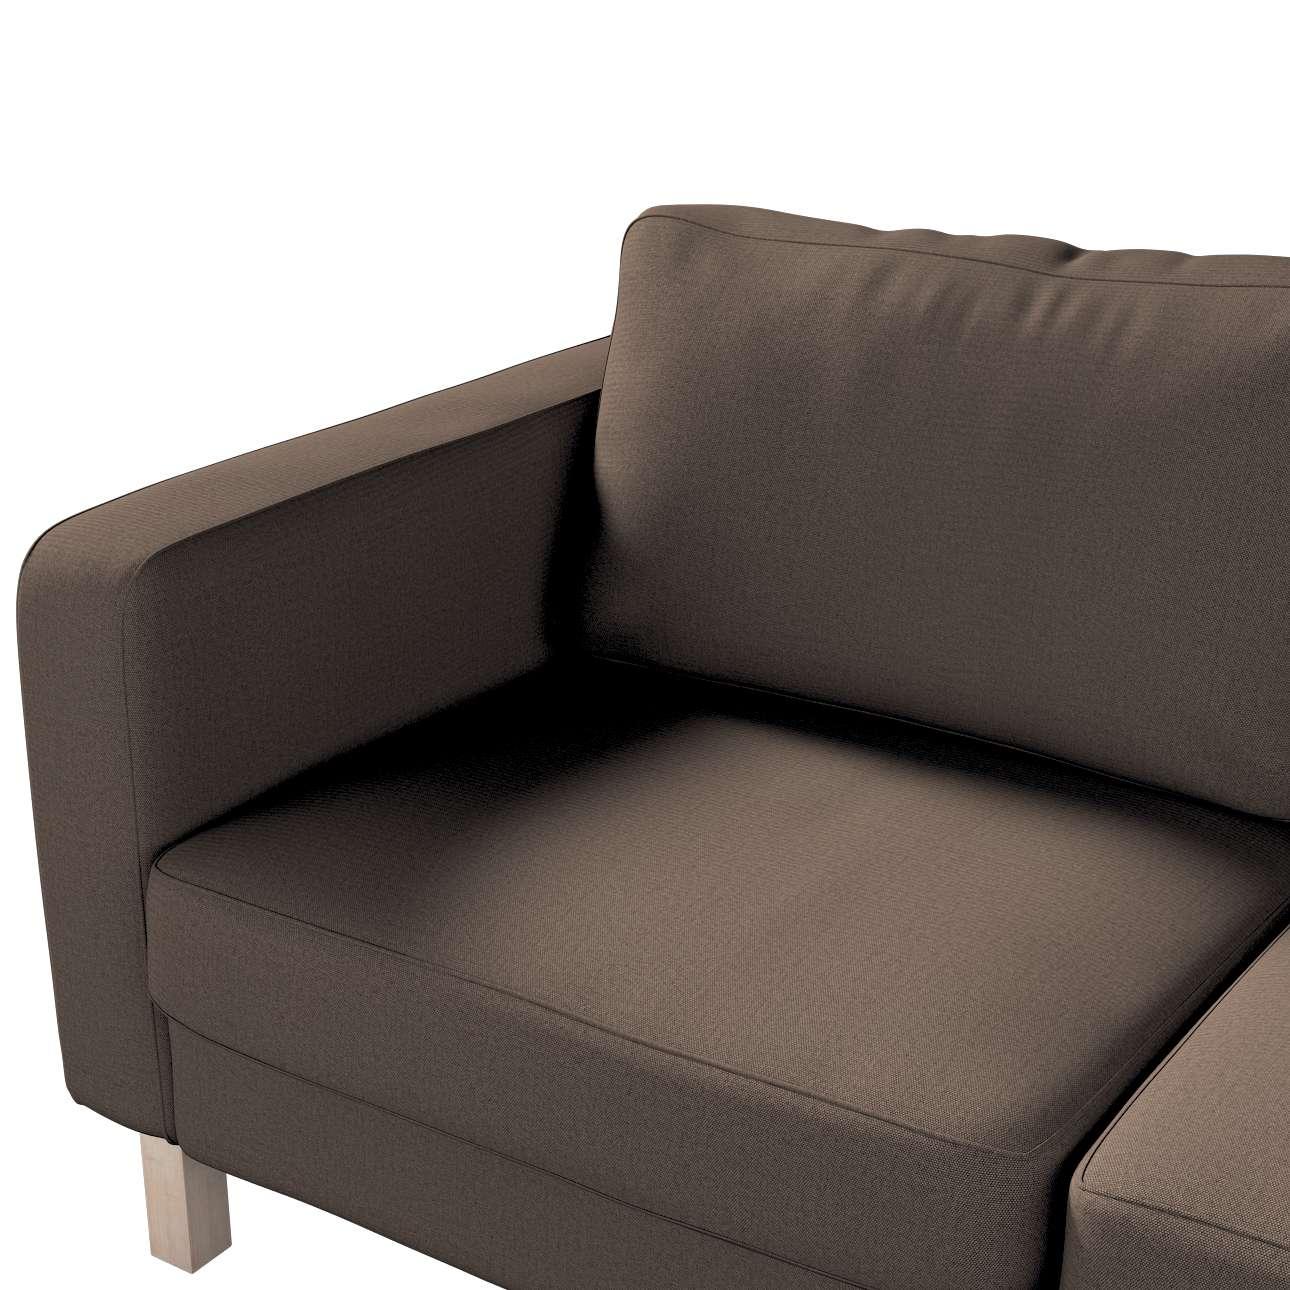 KARSLTAD dvivietės sofos užvalkalas kolekcijoje Etna , audinys: 705-08